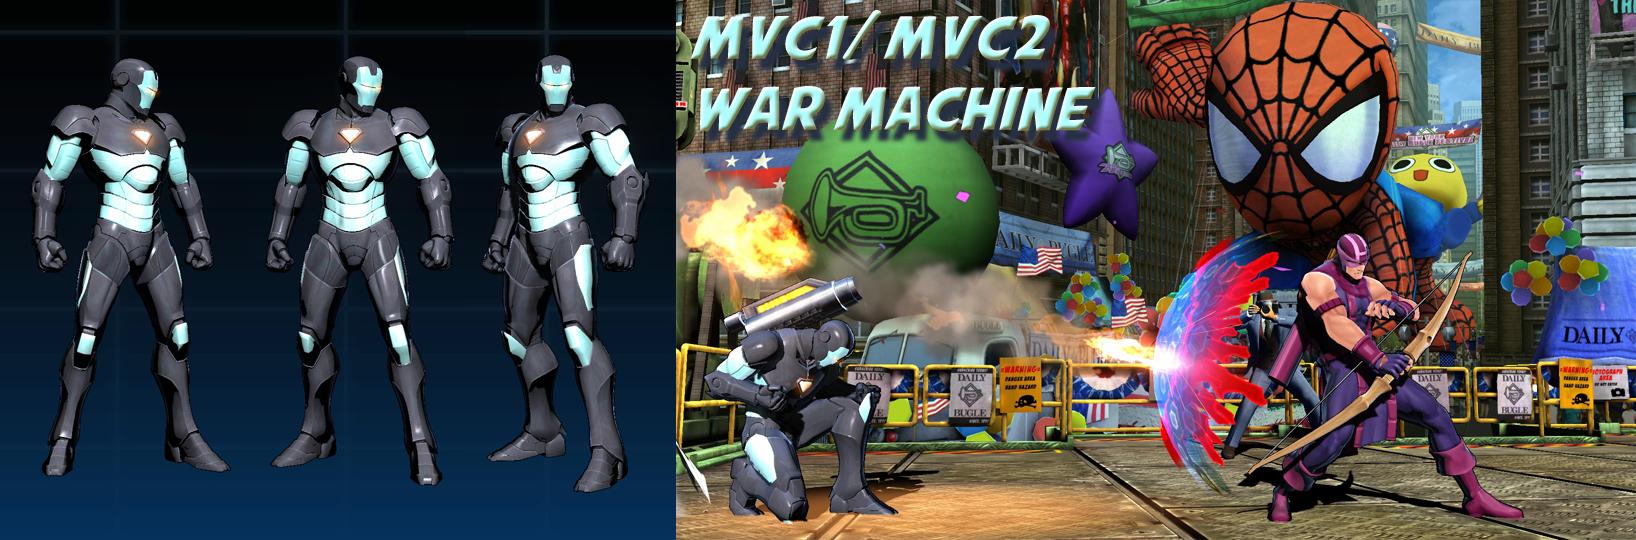 mvc war machine